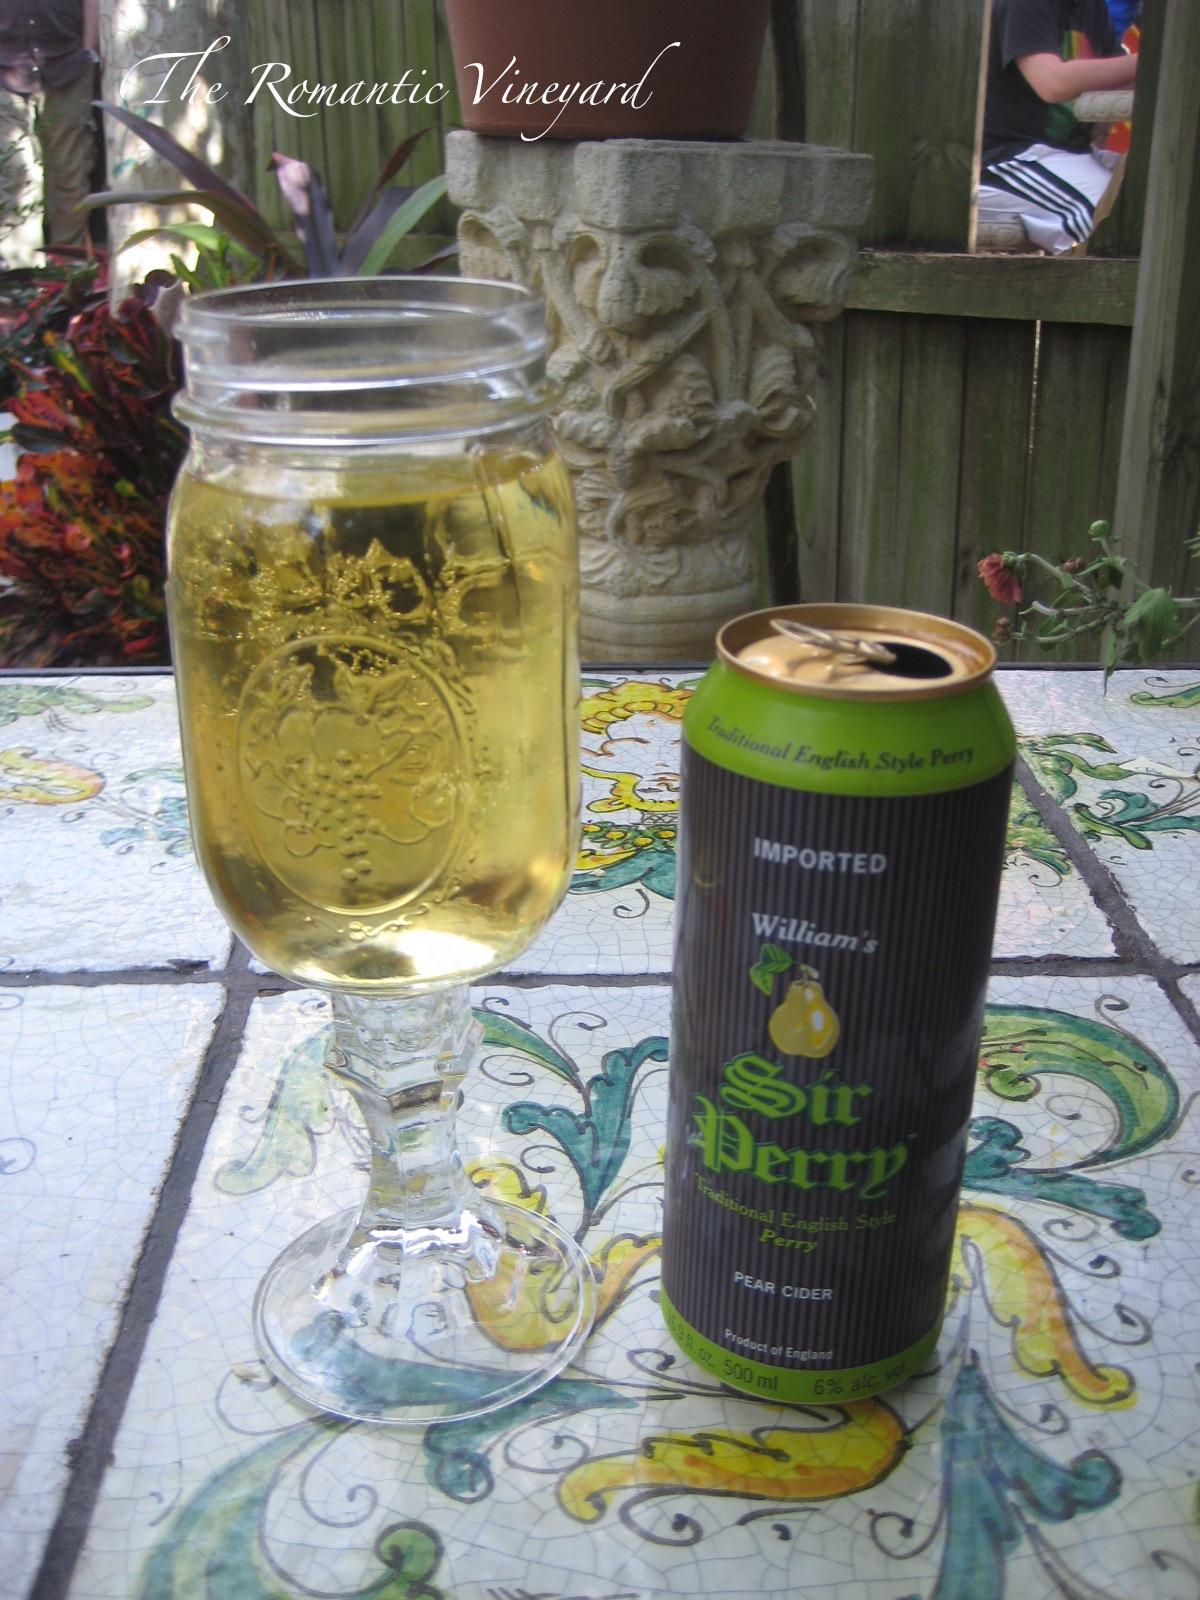 Romantic orlando yellow dog eats bistro the romantic vineyard - Stemmed mason jars ...